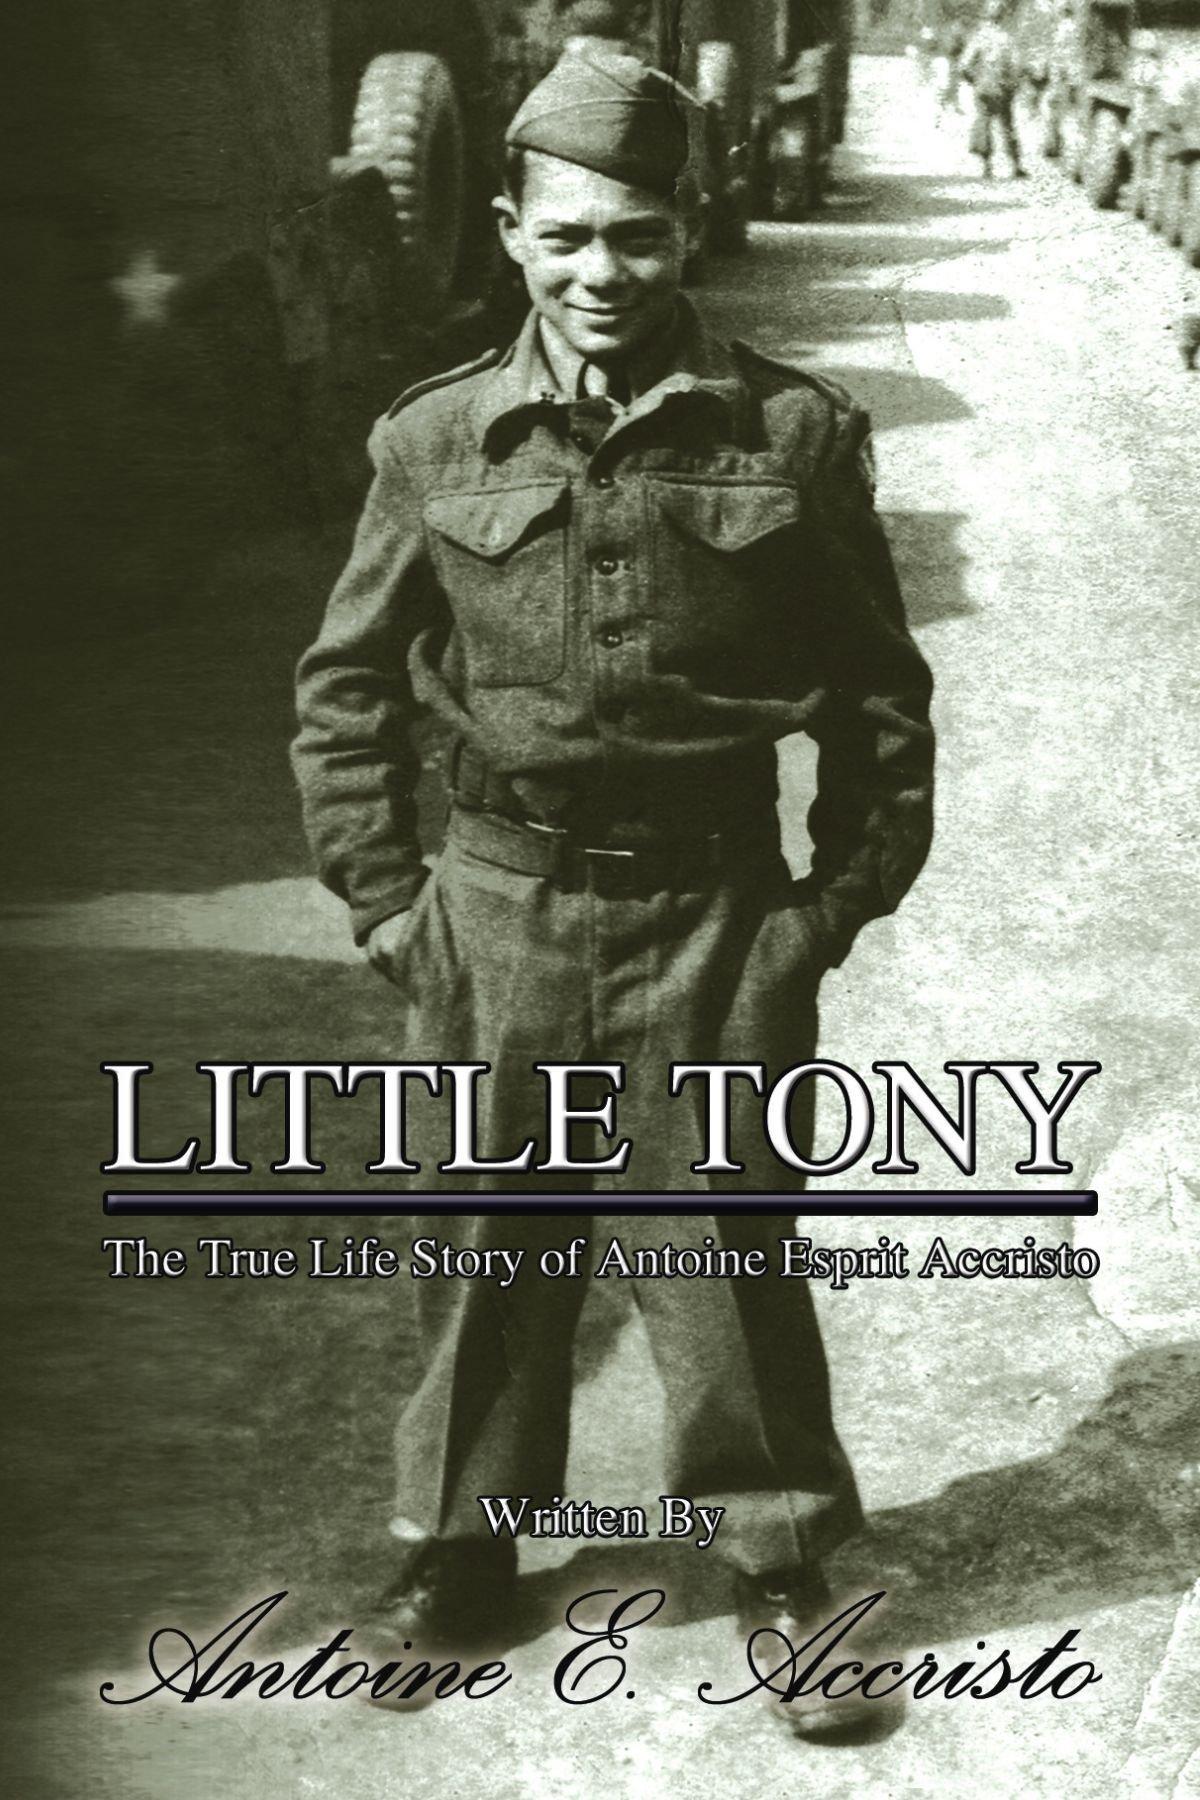 Read Online Little Tony: The True Life Story of Antoine Esprit Accristo PDF